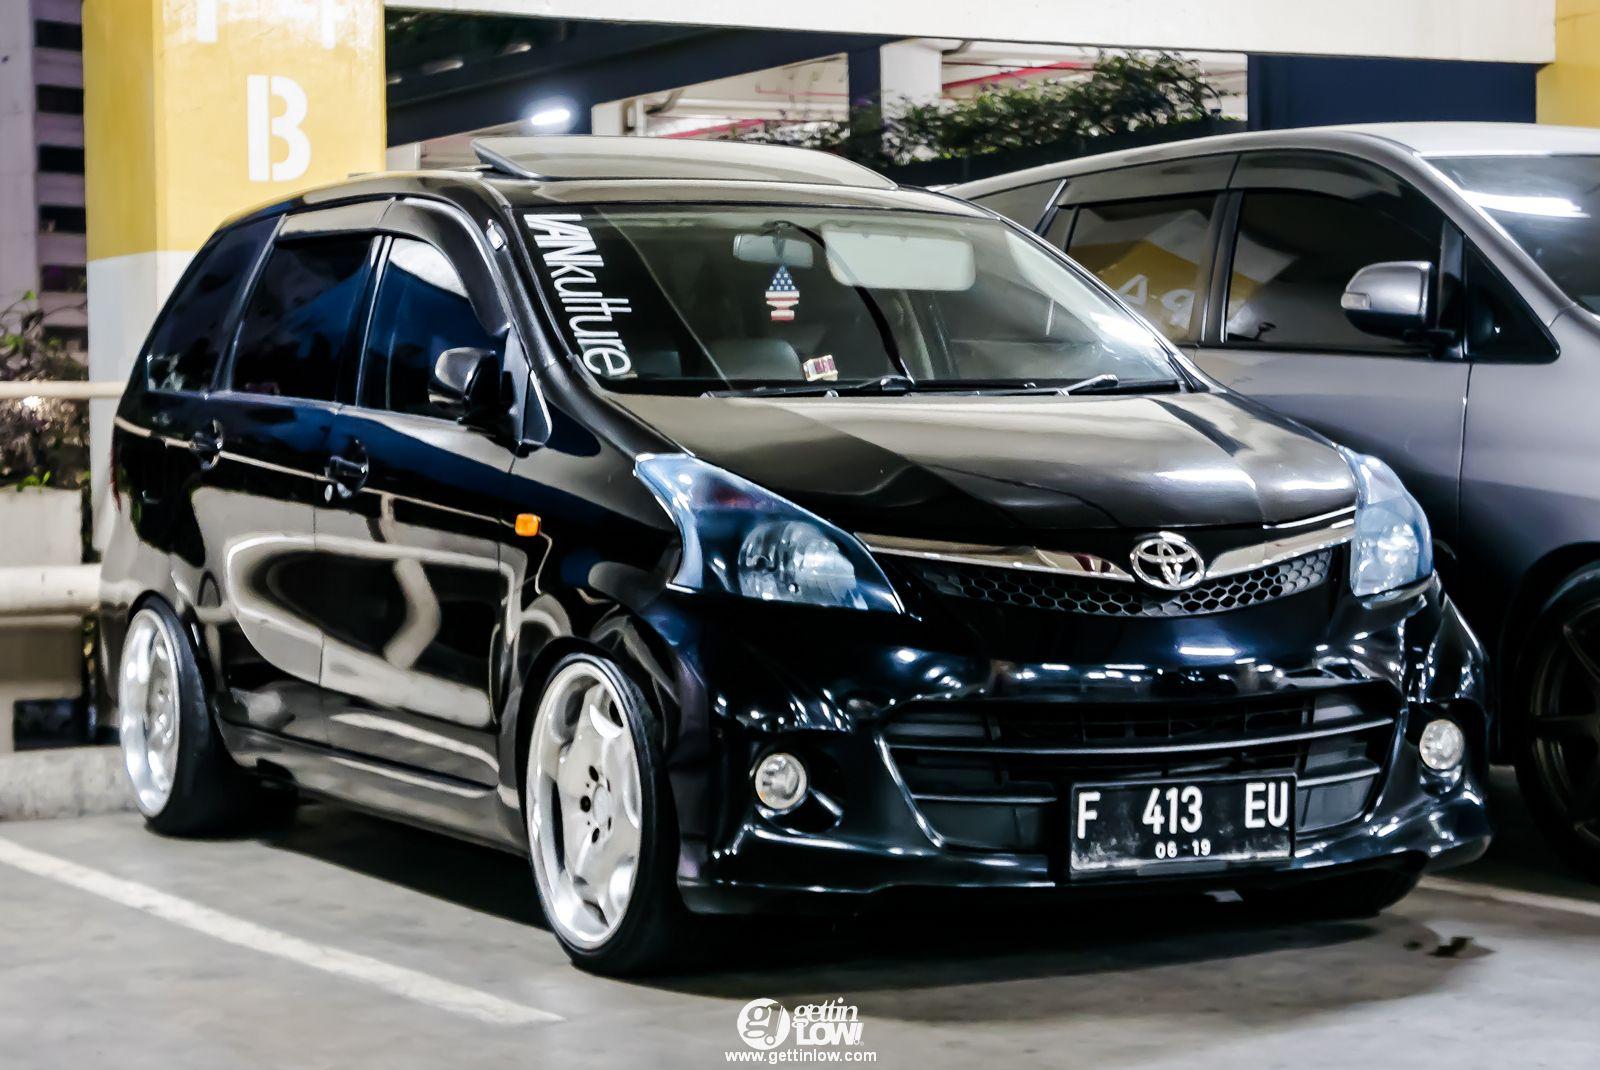 Grand New Avanza Veloz Modifikasi Spesifikasi 1.5 Toyota In Style Cars Motorcycles